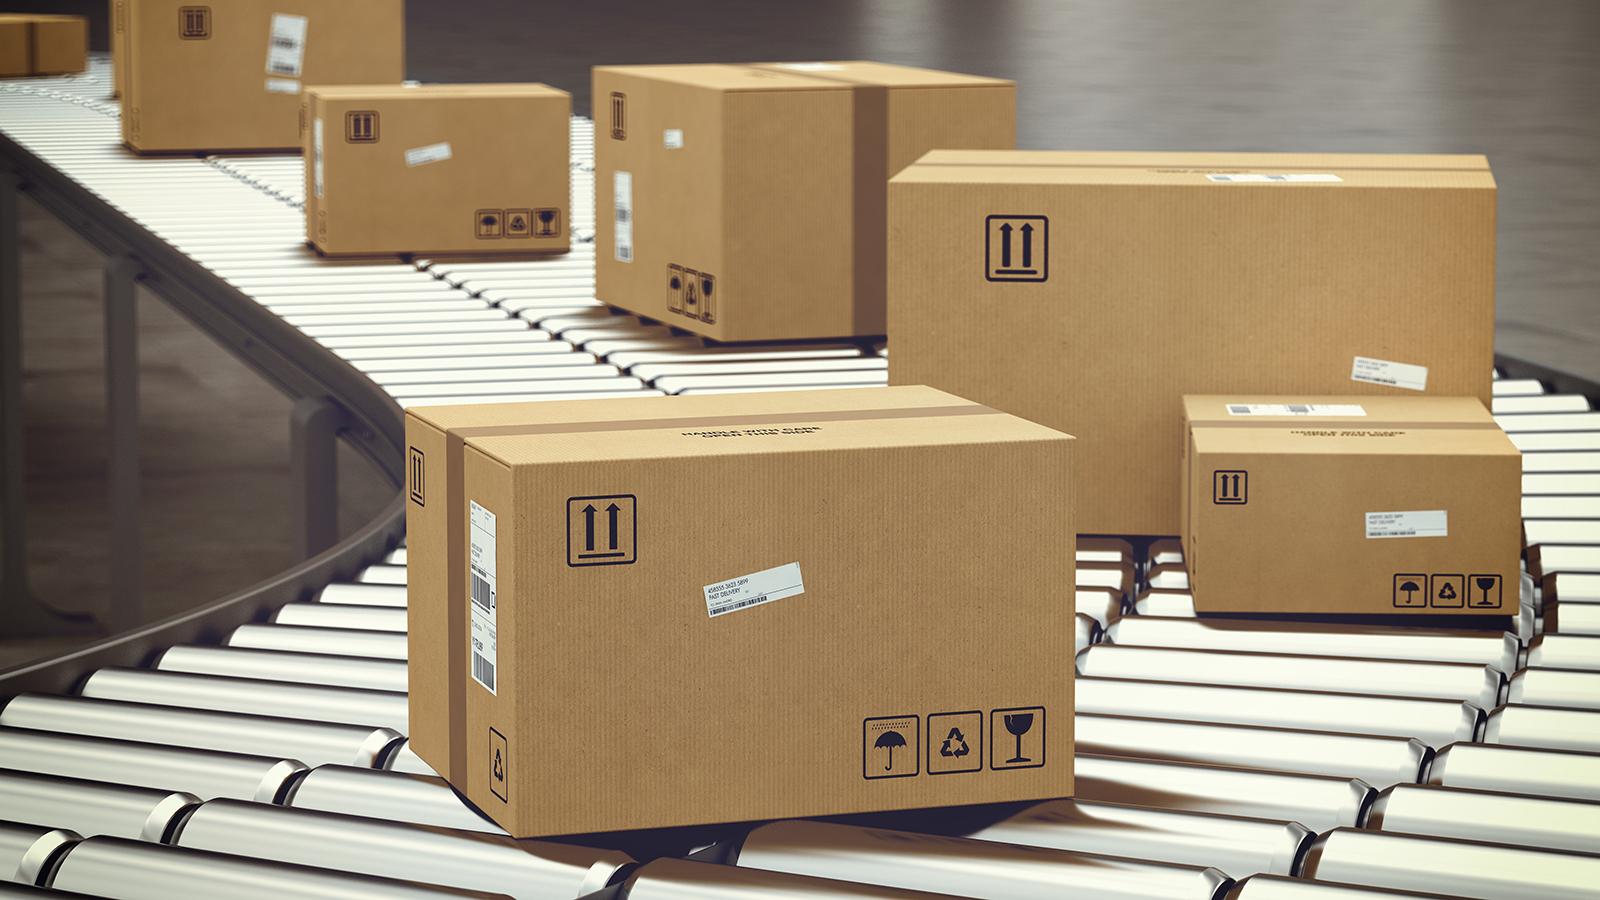 omnichannel-webinar-parcels-conveyor-belt_126714957